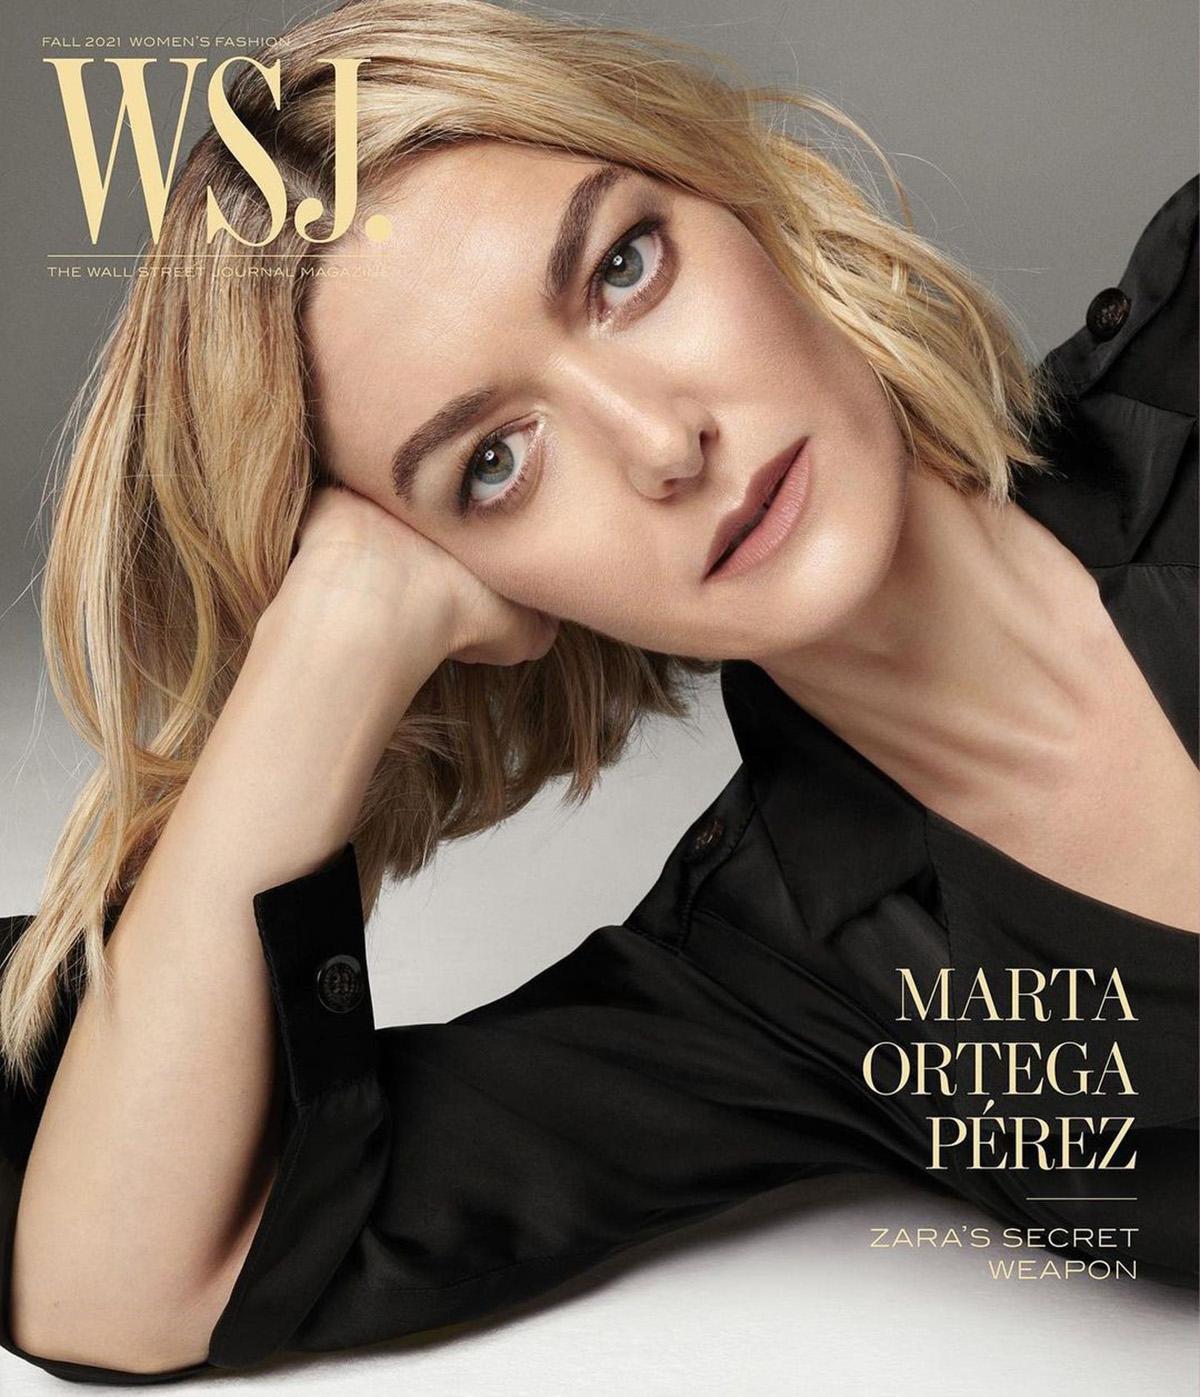 Marta Ortega Pérez covers WSJ. Magazine Fall 2021 Digital Edition by Steven Meisel